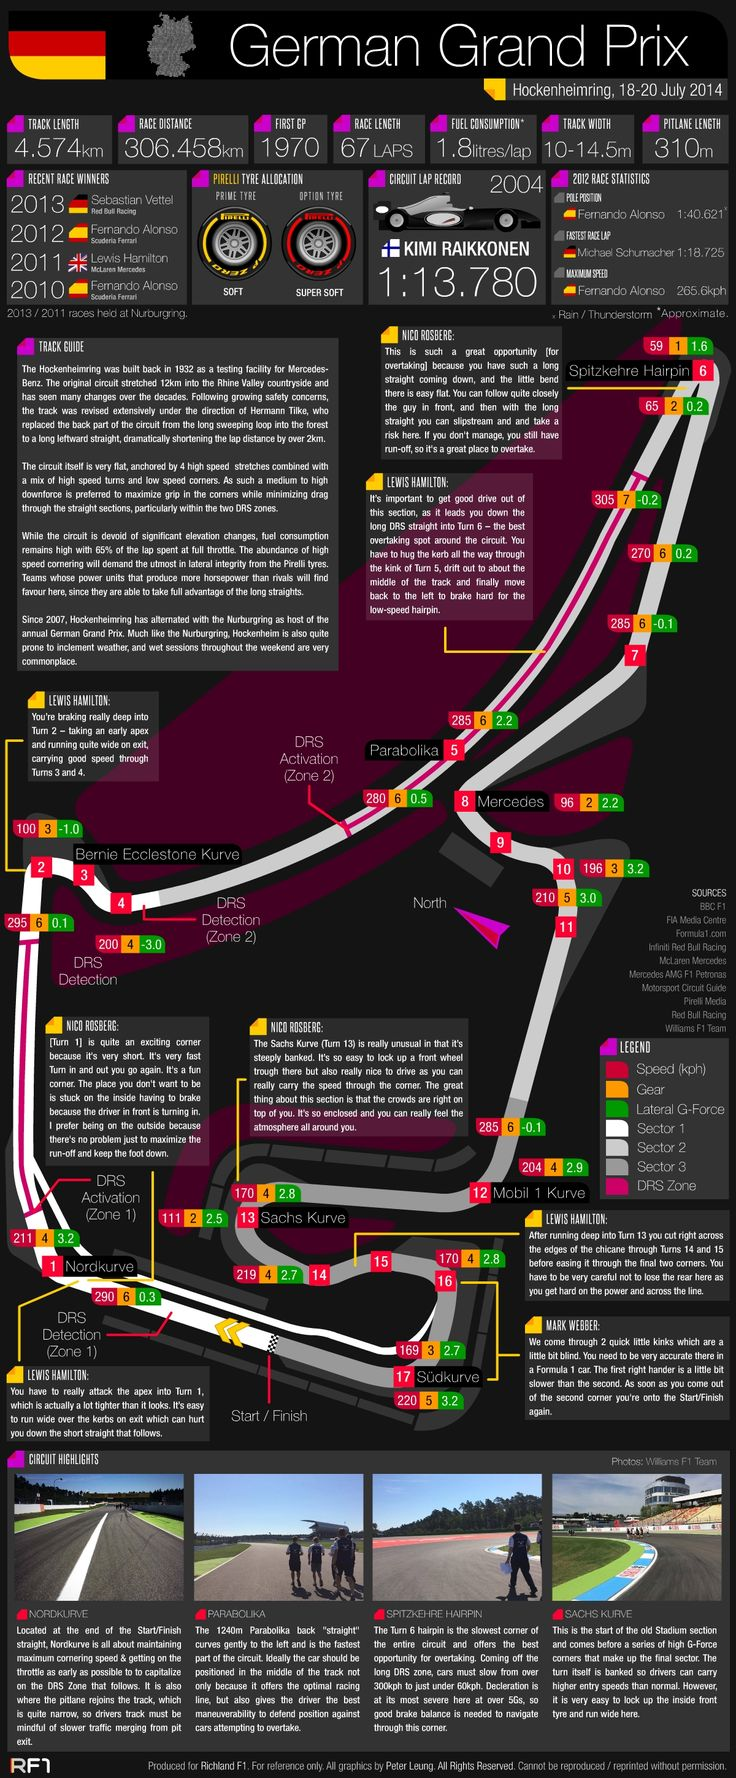 Grand Prix Guide - 2014 German Grand Prix #F1